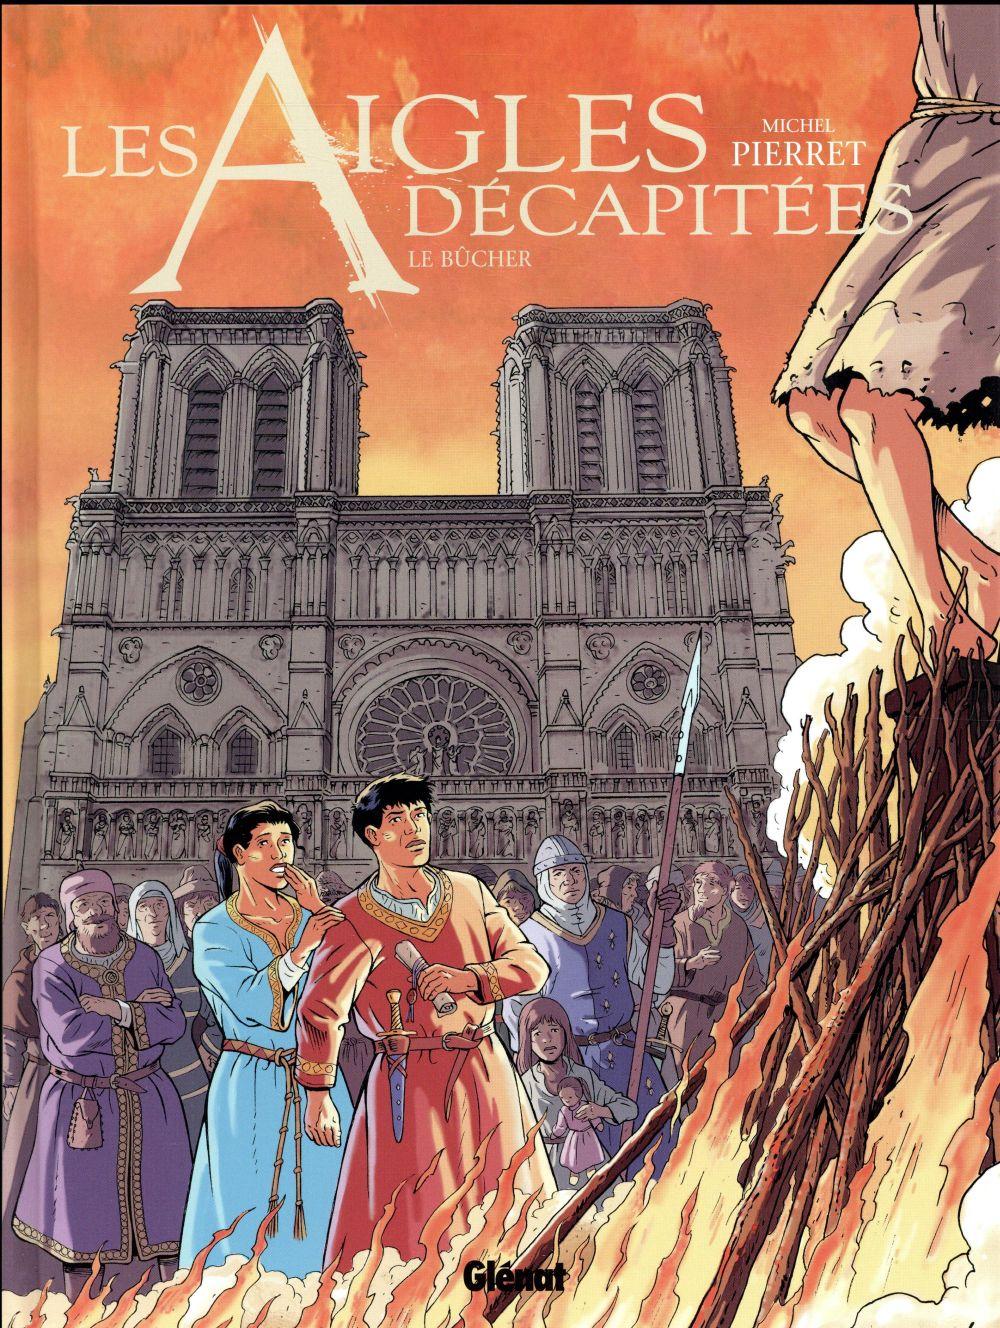 LES AIGLES DECAPITEES - TOME 28